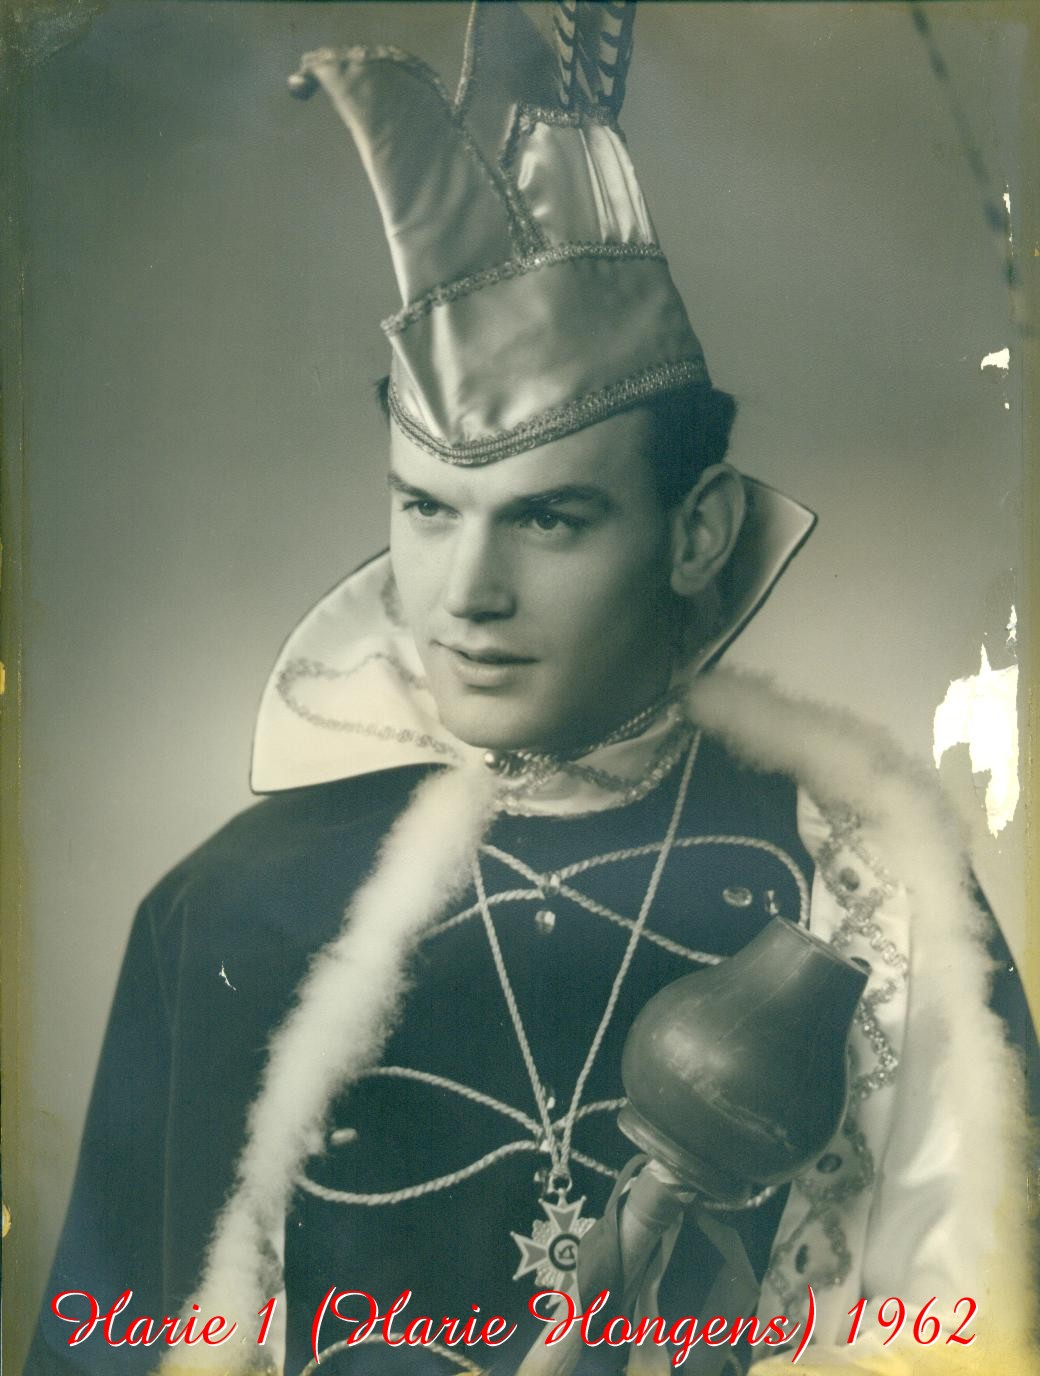 1962 Prins Harrie (I) Hongens